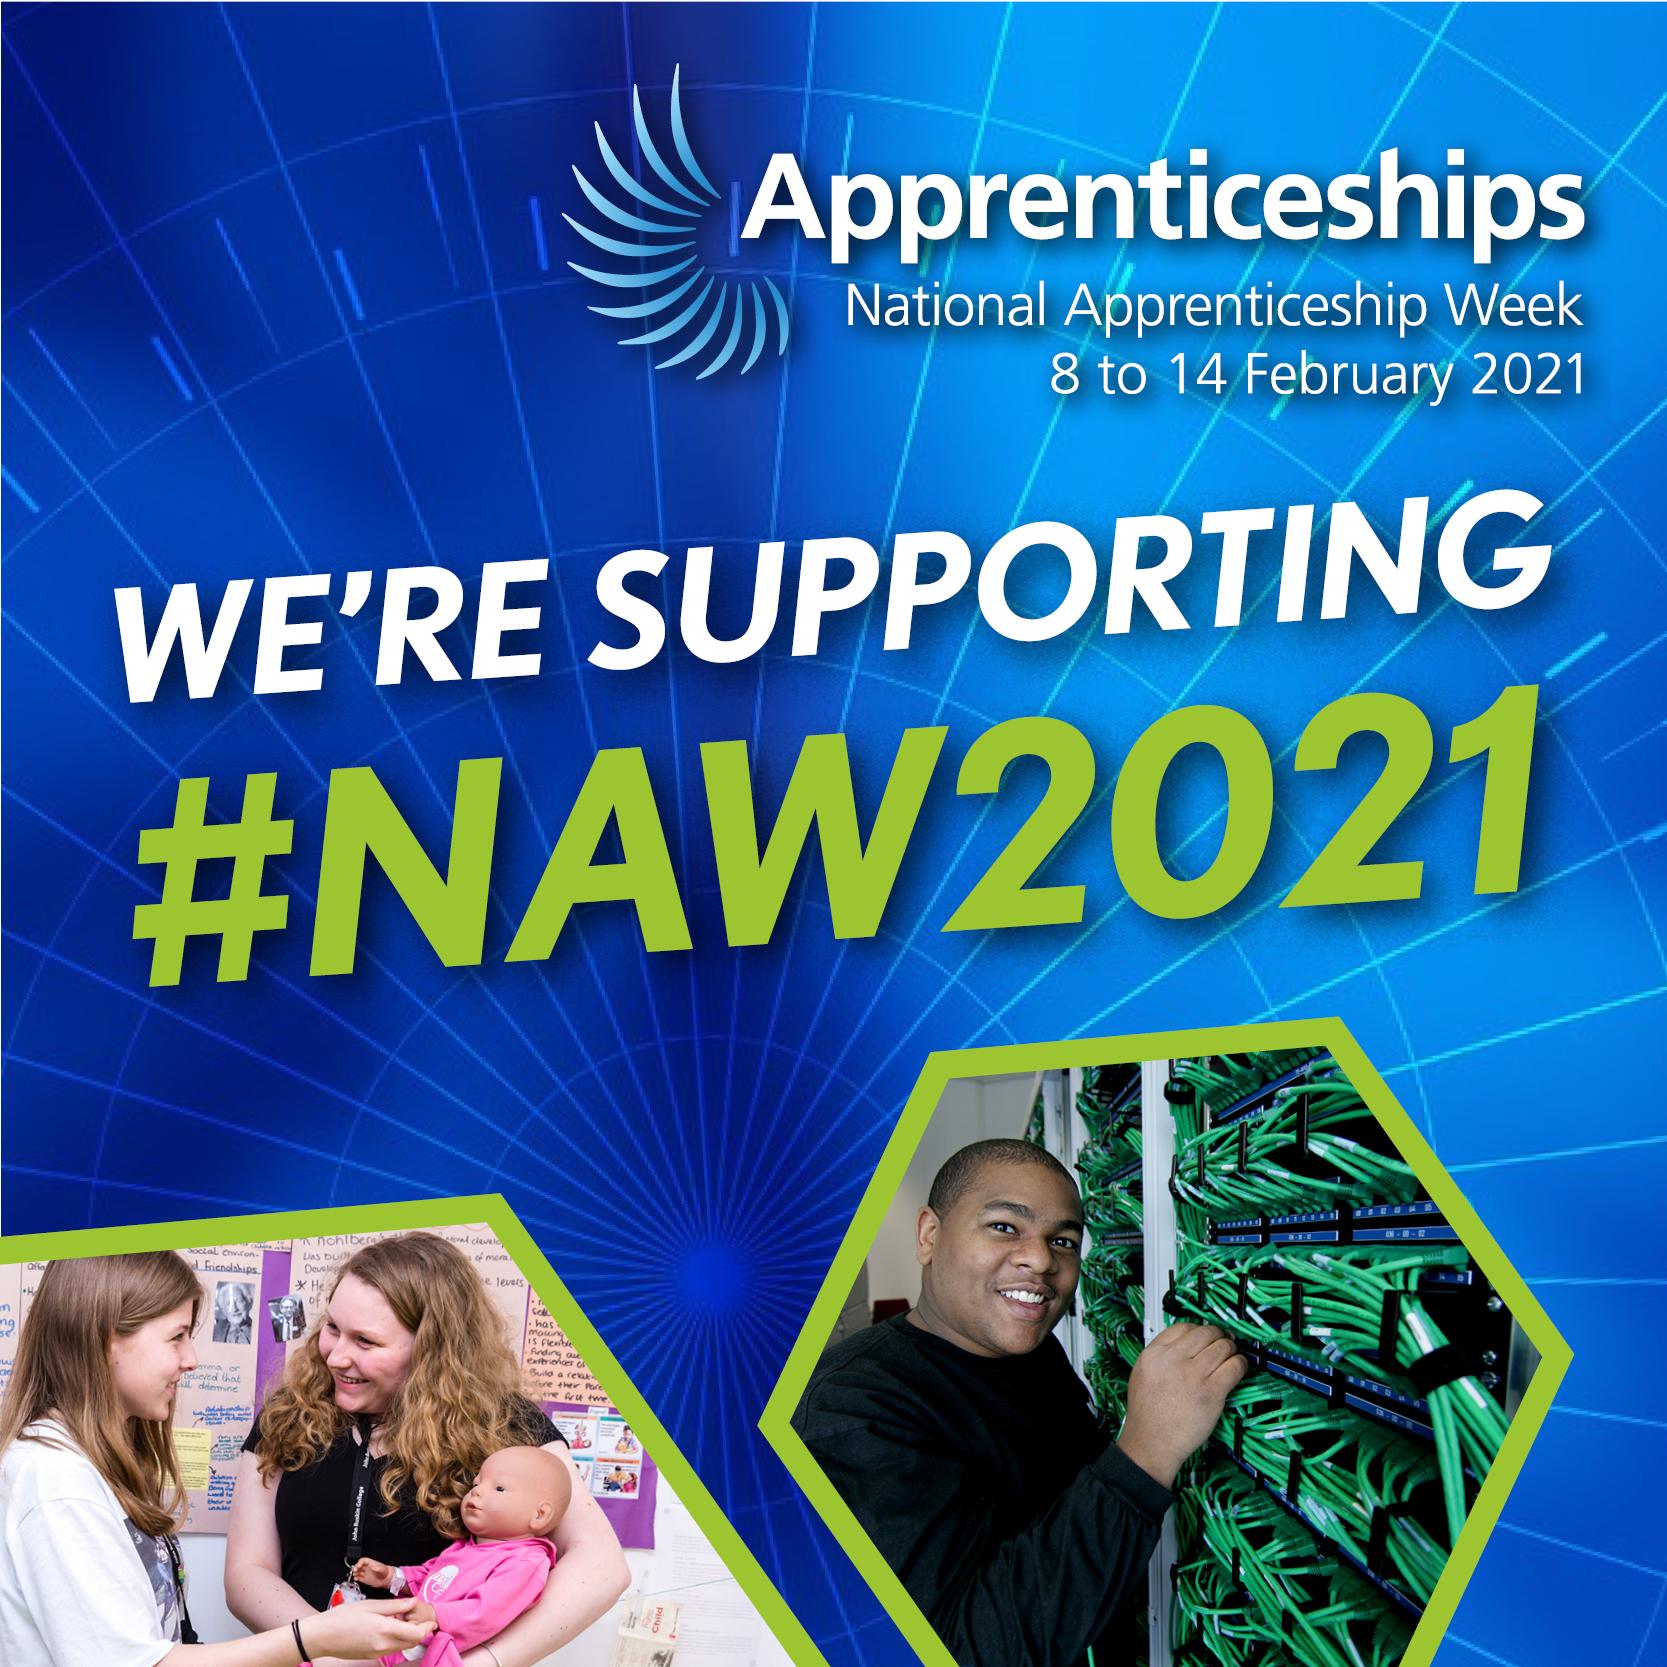 National Apprenticeship Week - Day 1